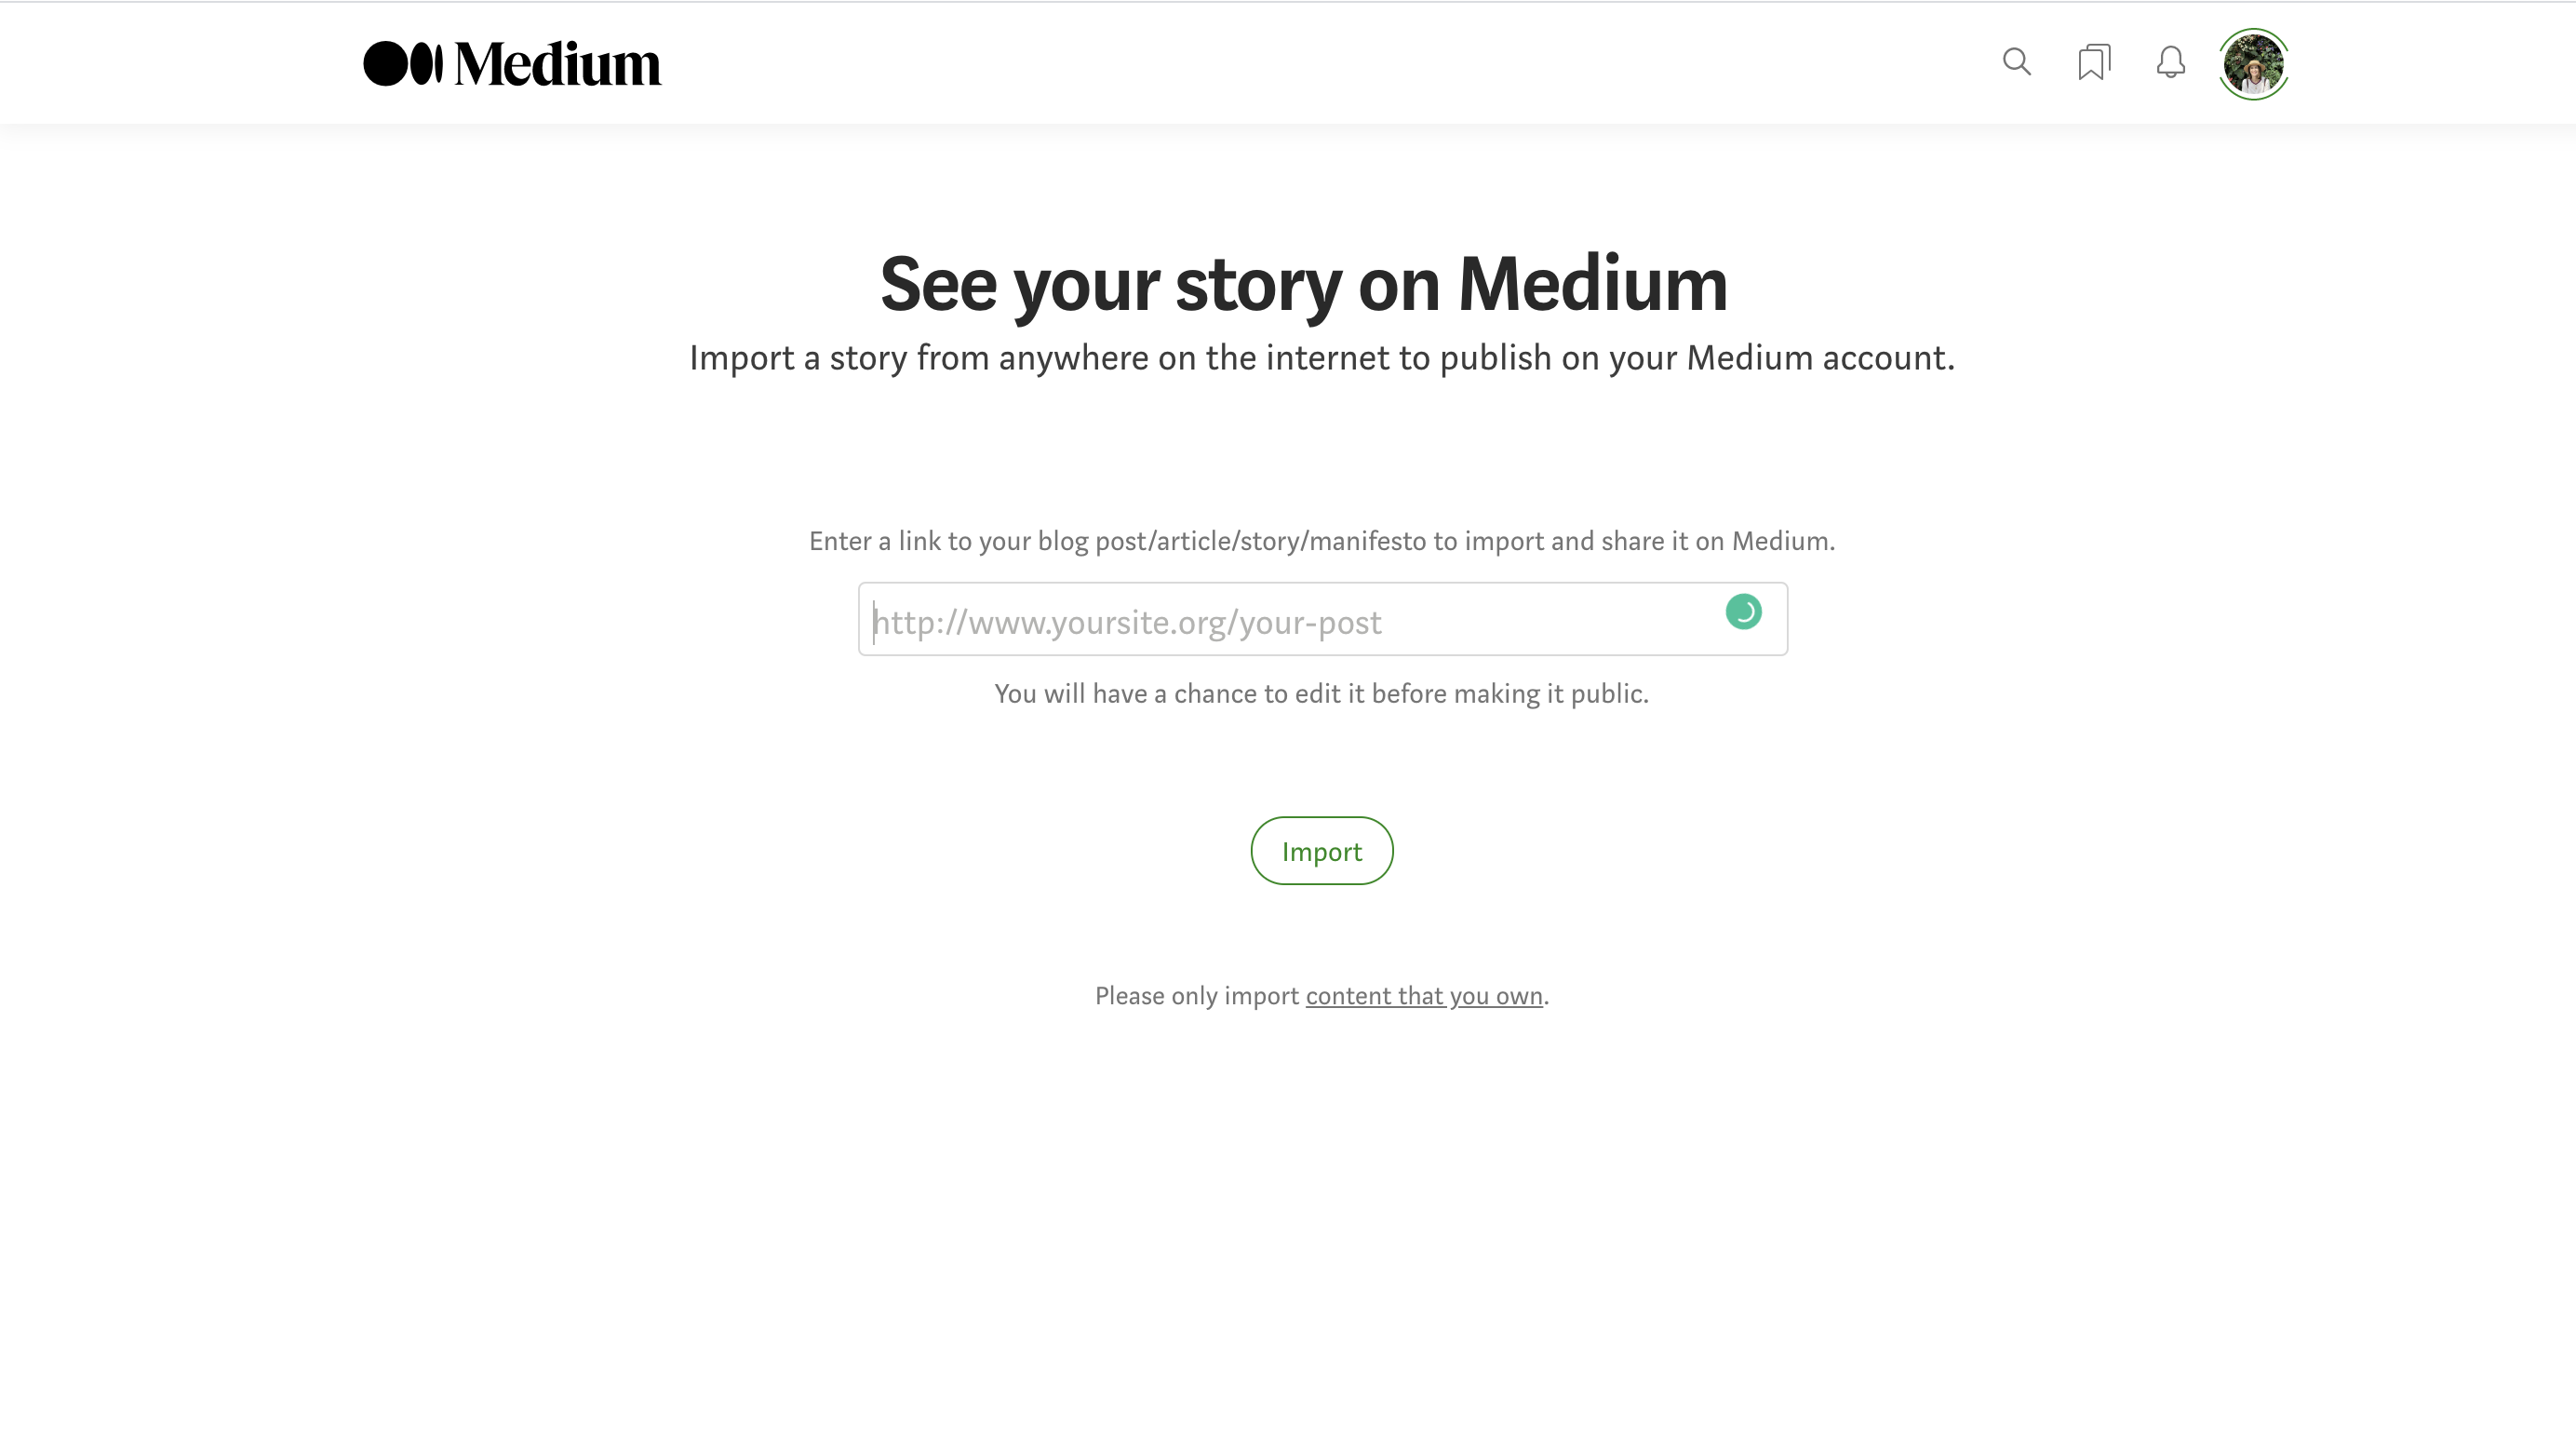 republishing content on Medium